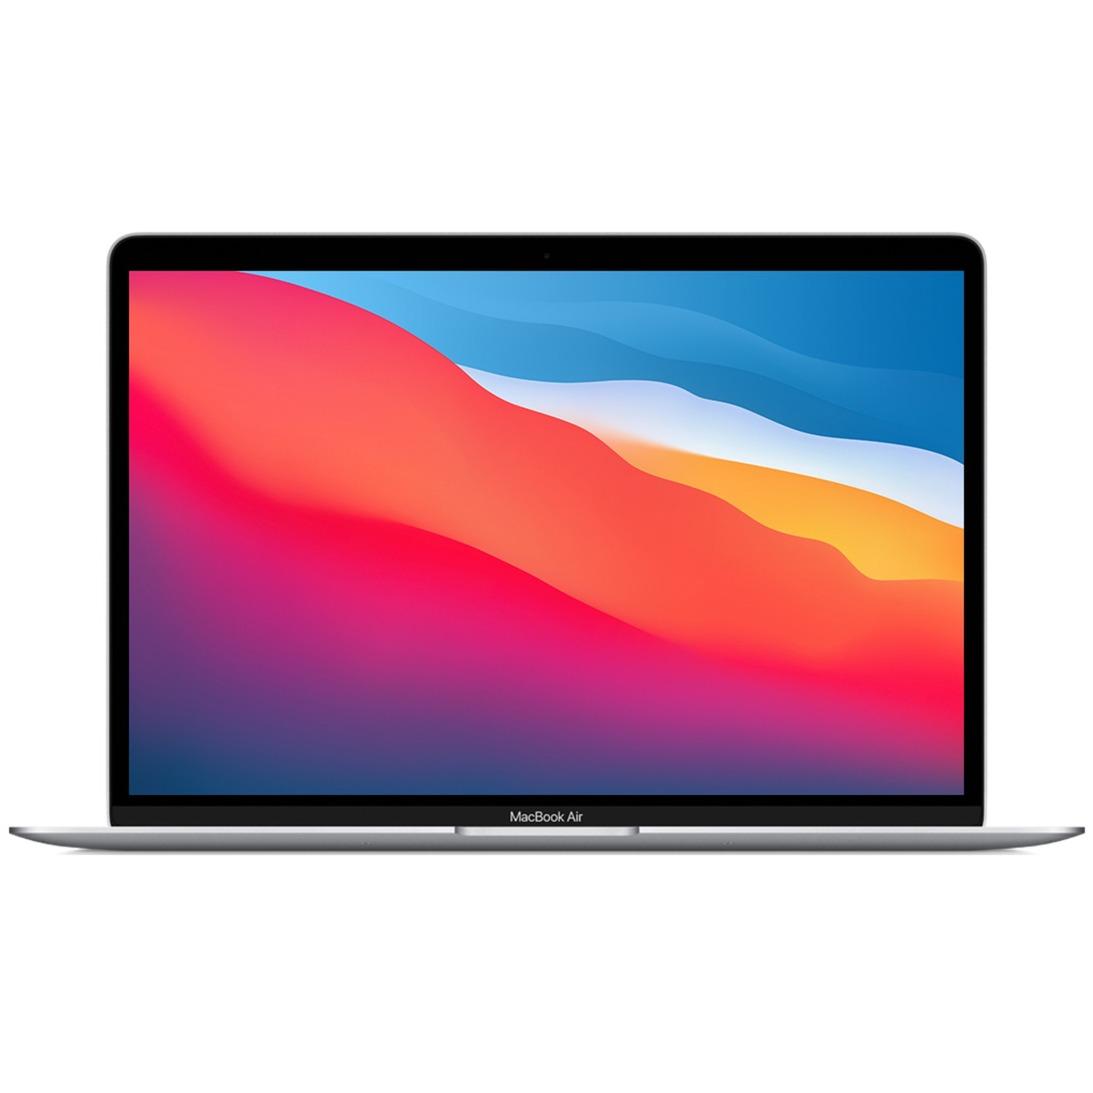 Produktbild: MacBook Air 33,8 cm (13,3